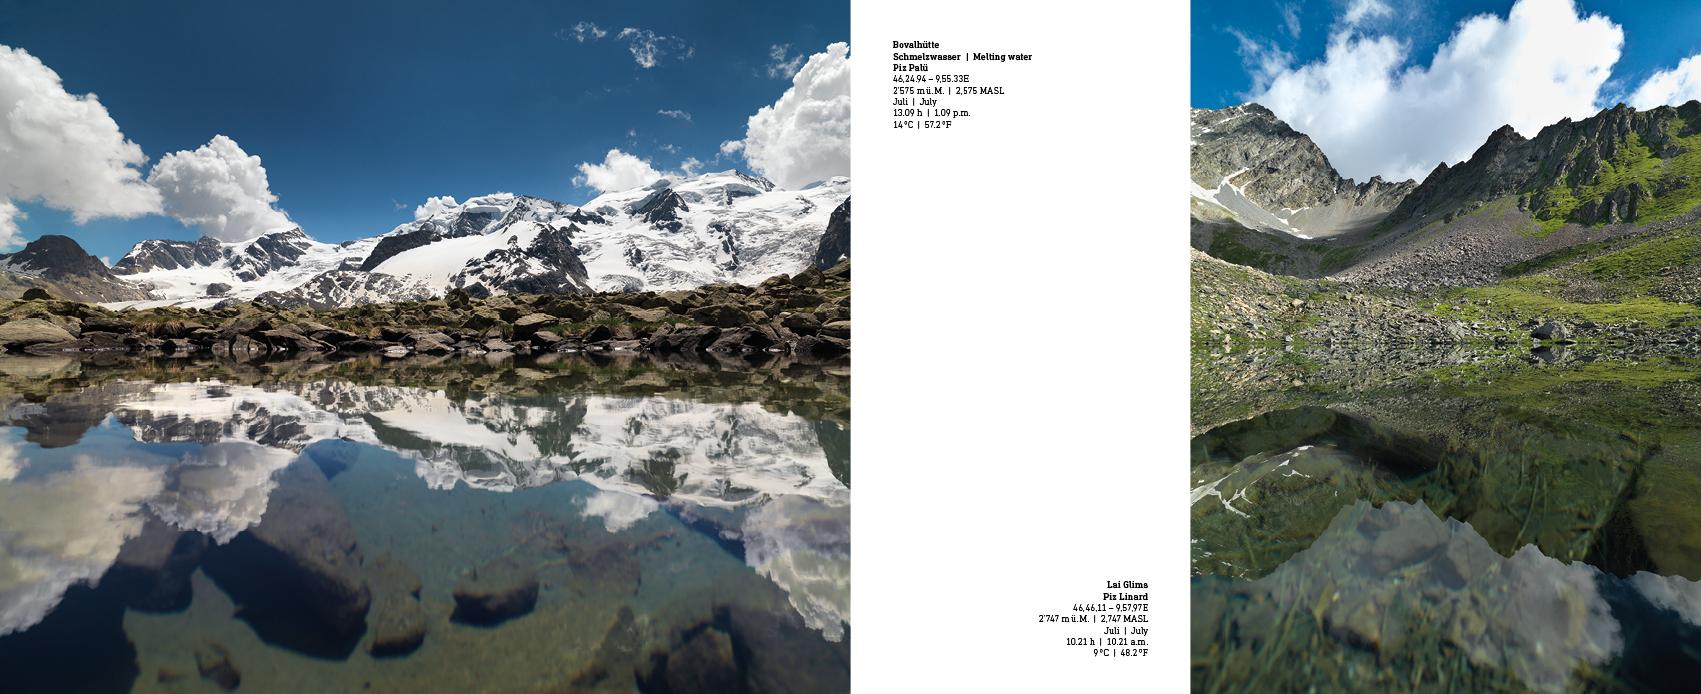 Seite 134-135